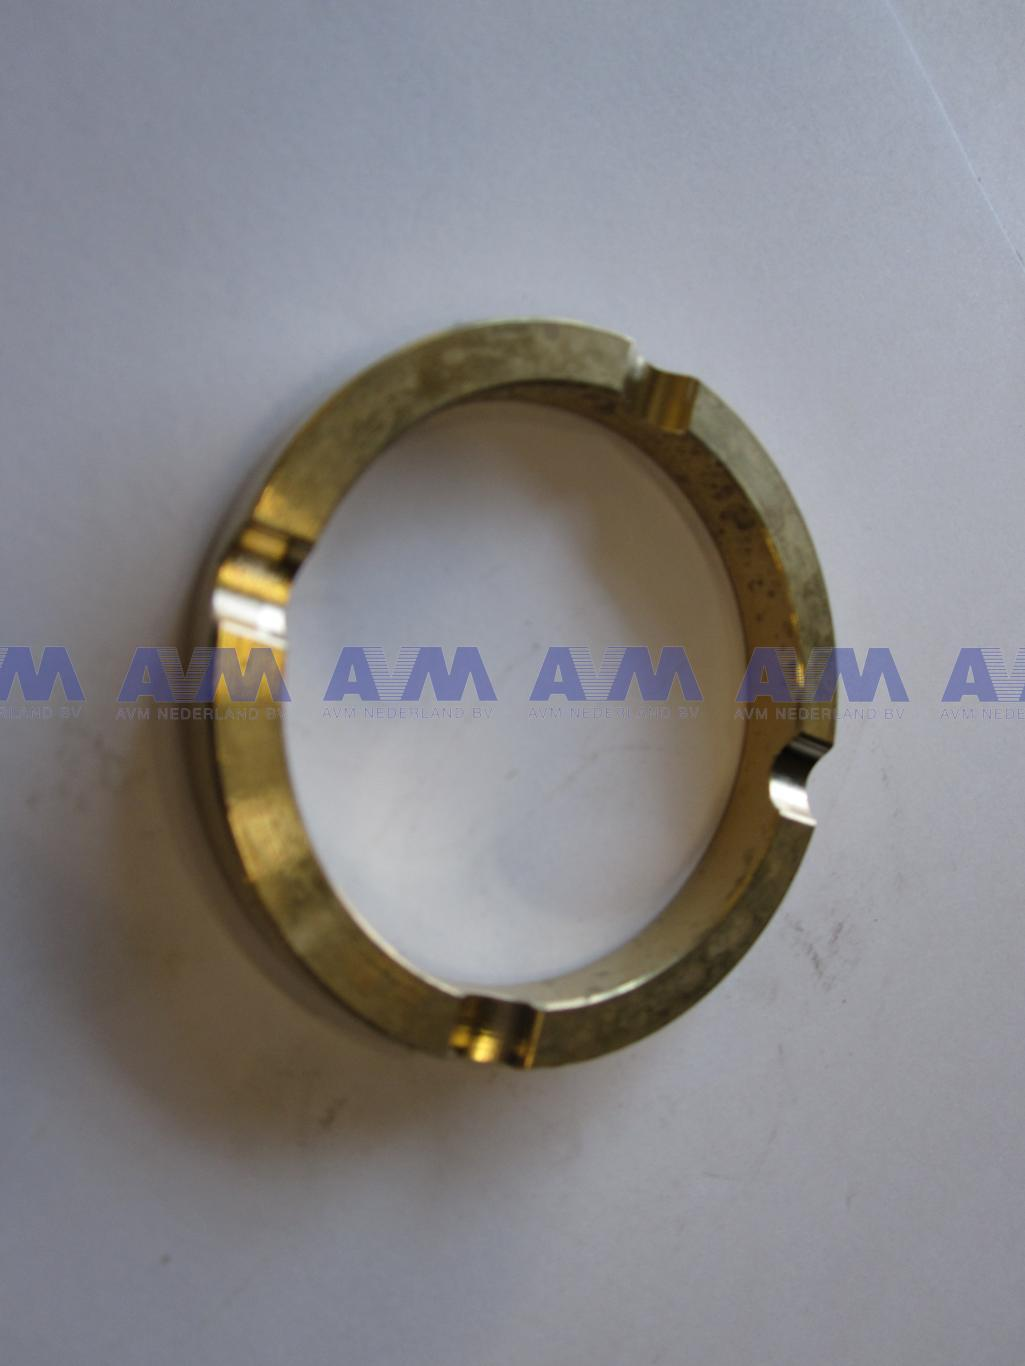 Aanloopring brons astap 7300954 Tadano Faun